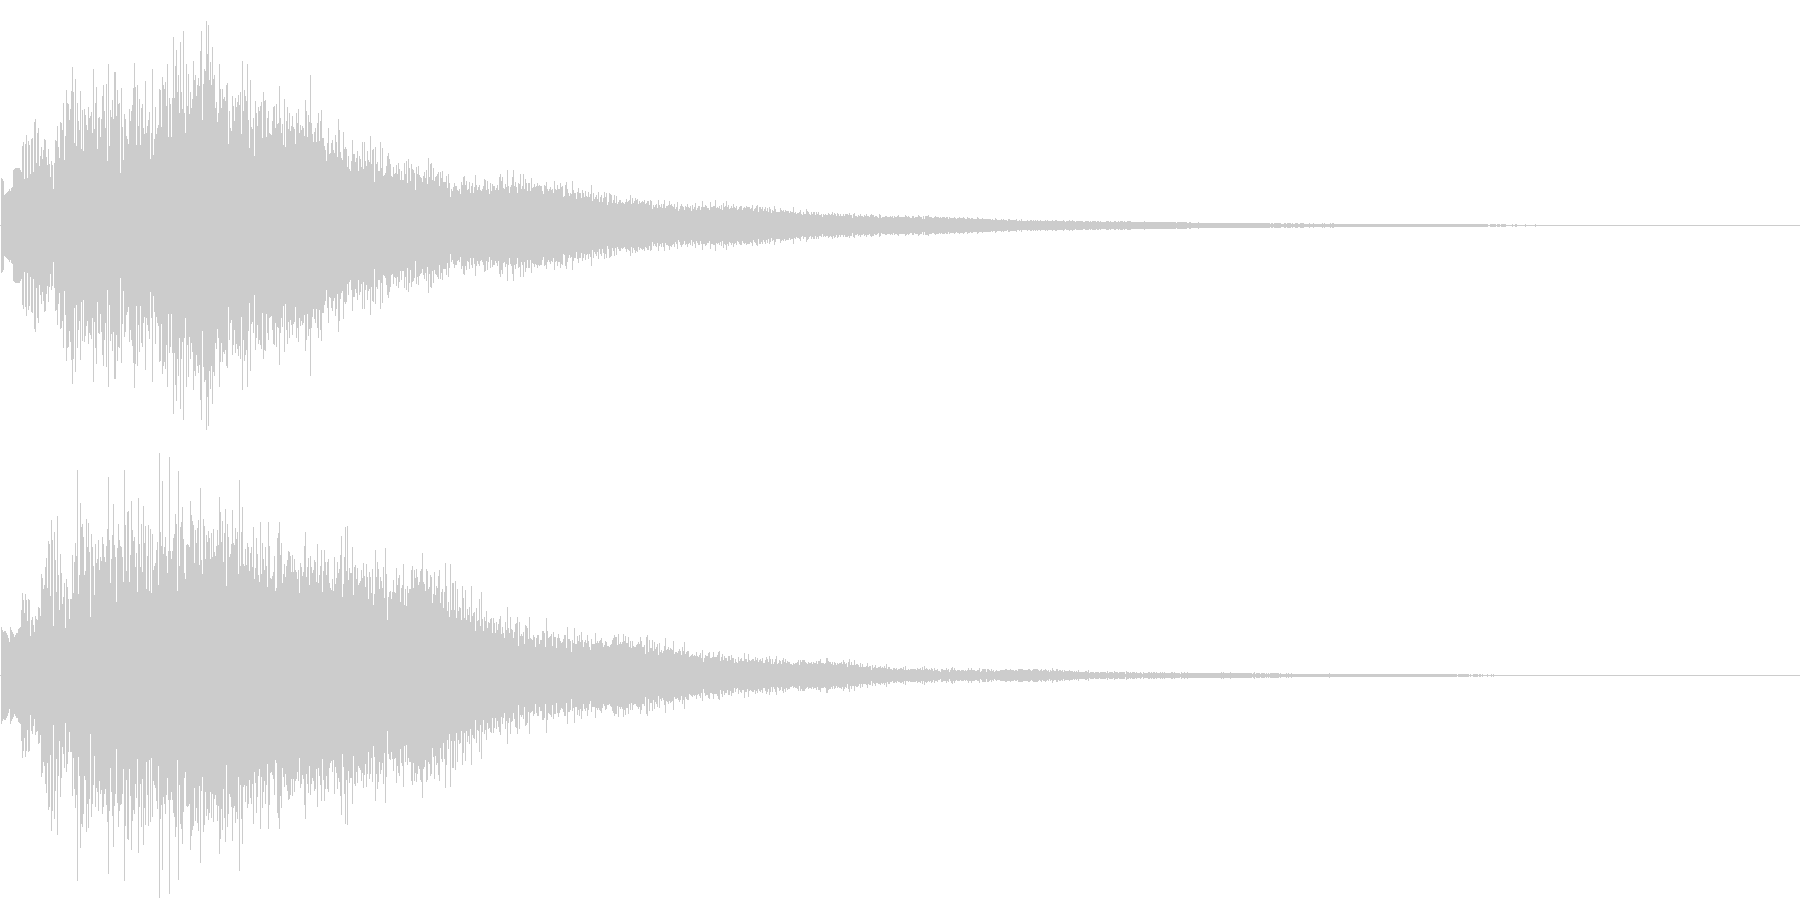 DOREMI ドレミ音階 キラキラFX1の未再生の波形